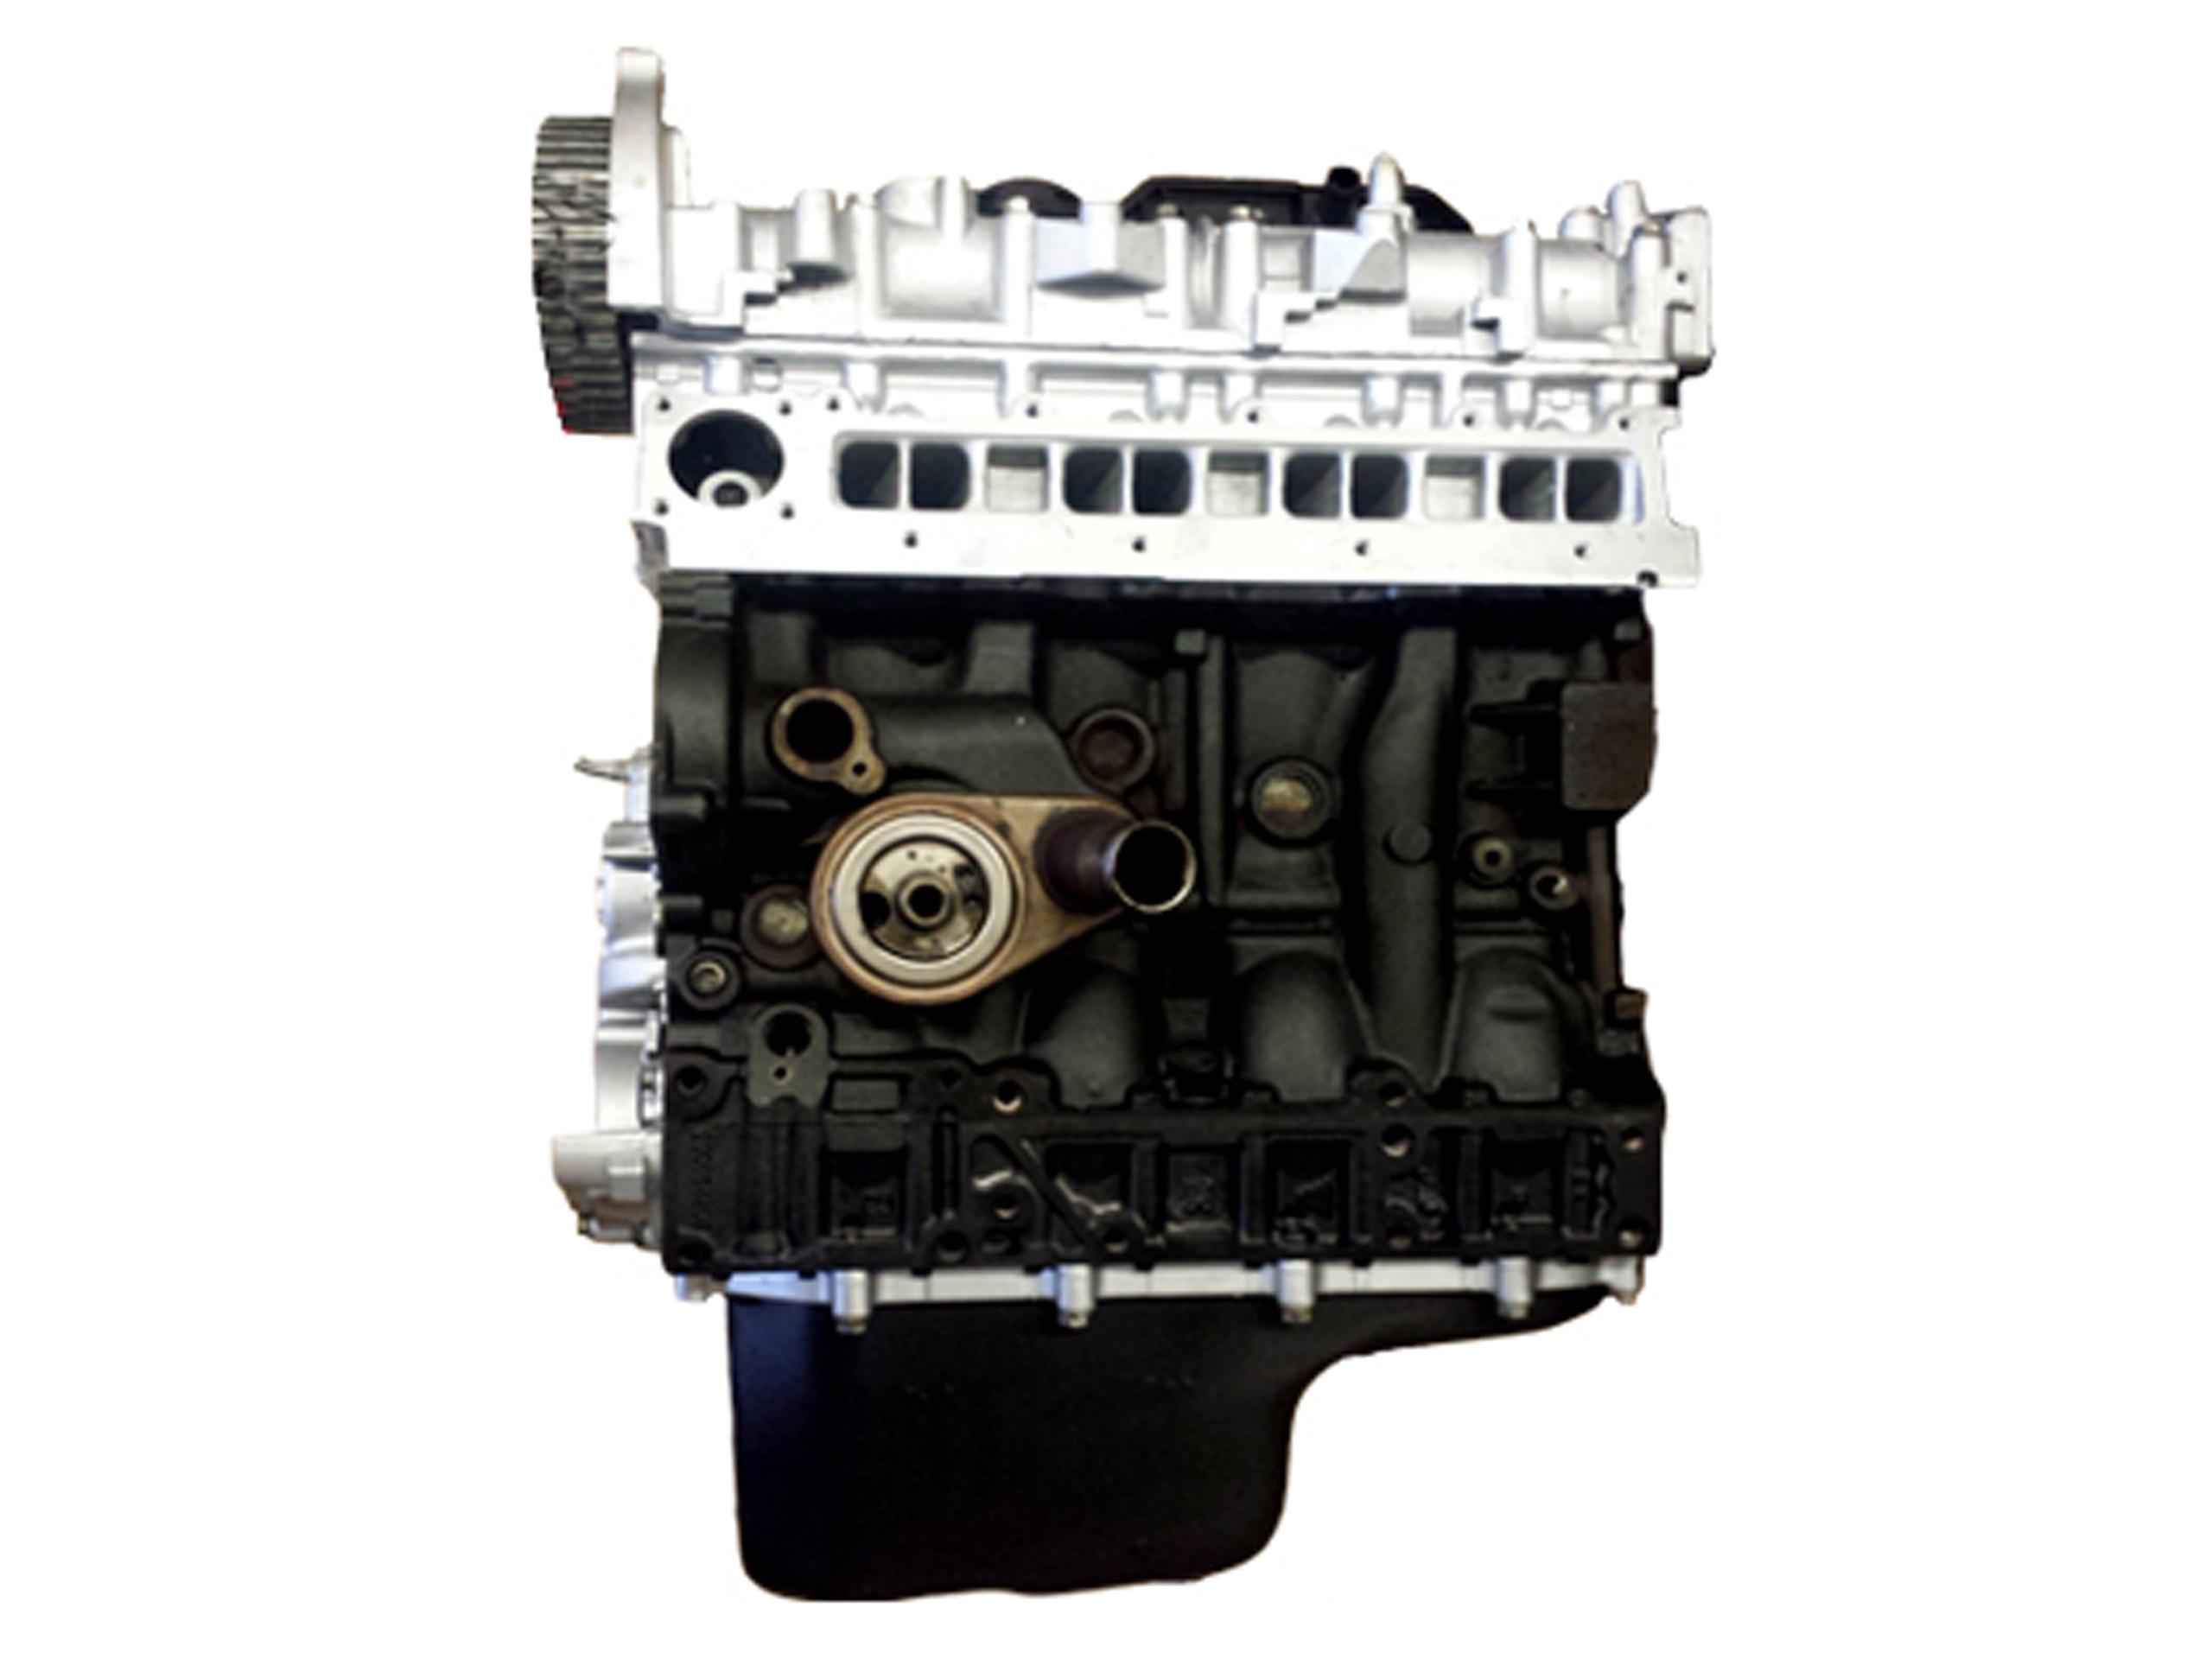 FIAT DUCATO ДВИГАТЕЛЬ 2.3 JTD 06-12 ENGINE F1AE0481D